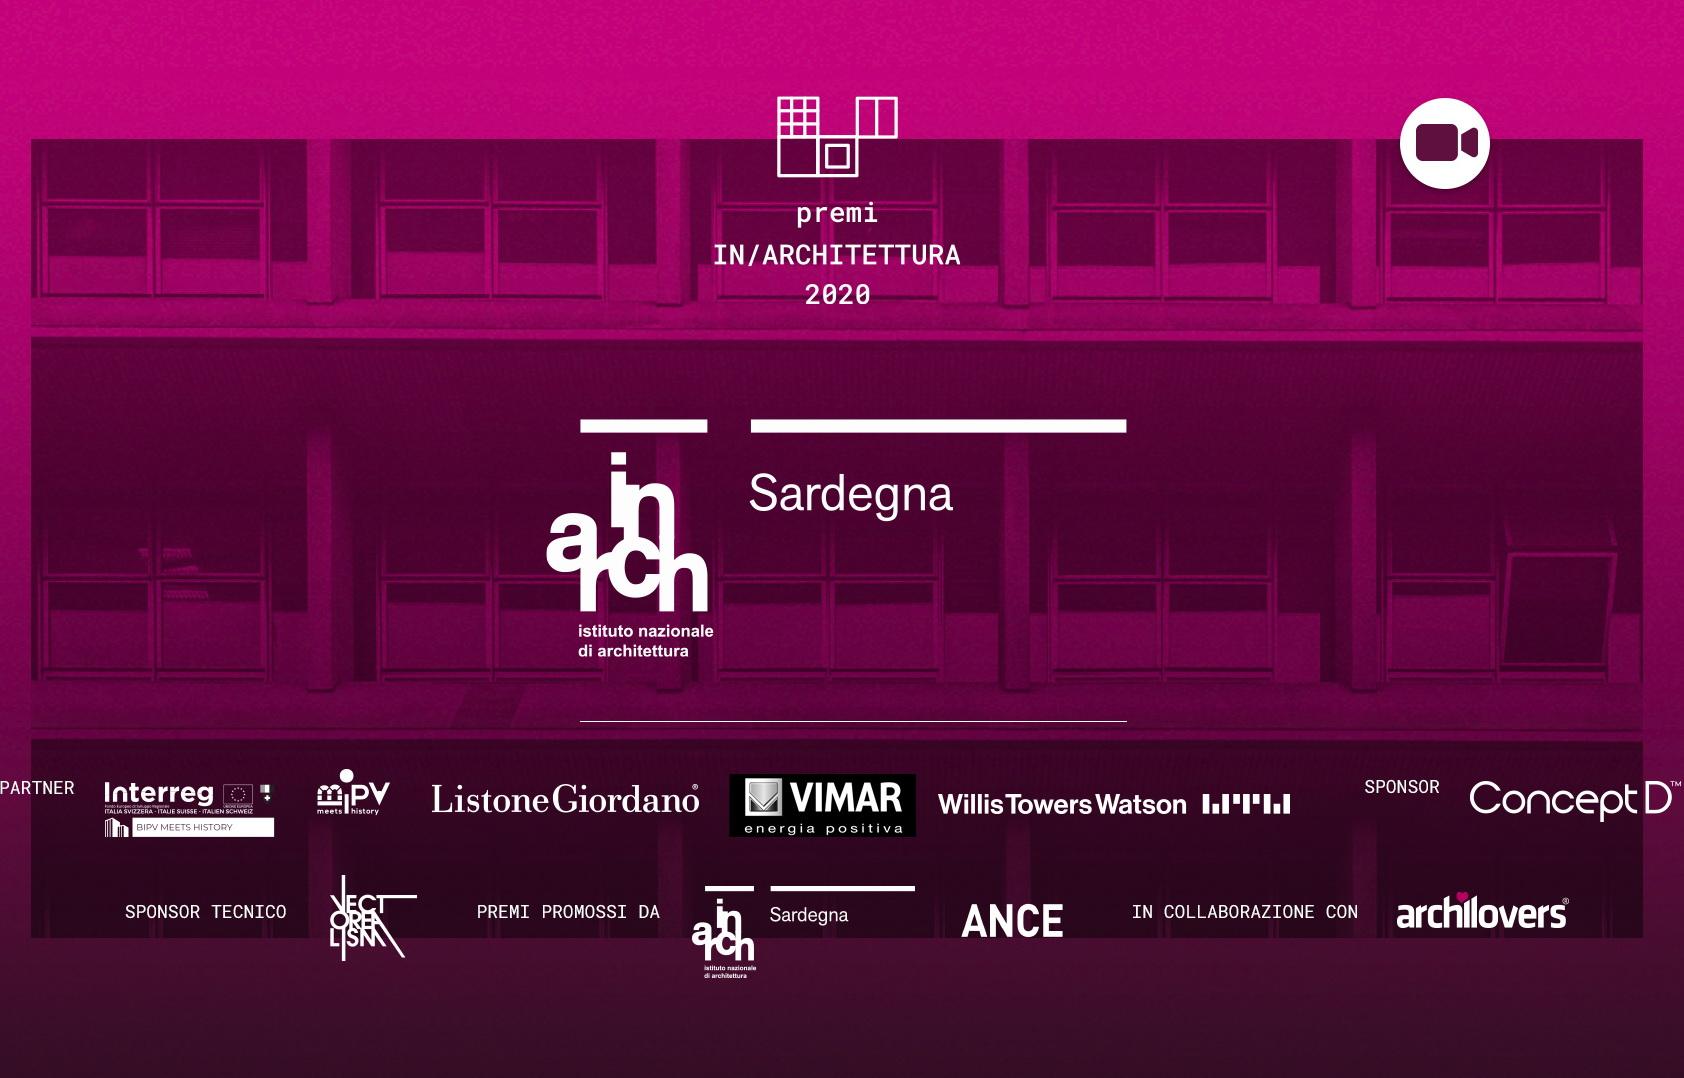 Video integrale – Premi In/Architettura 2020 Sardegna